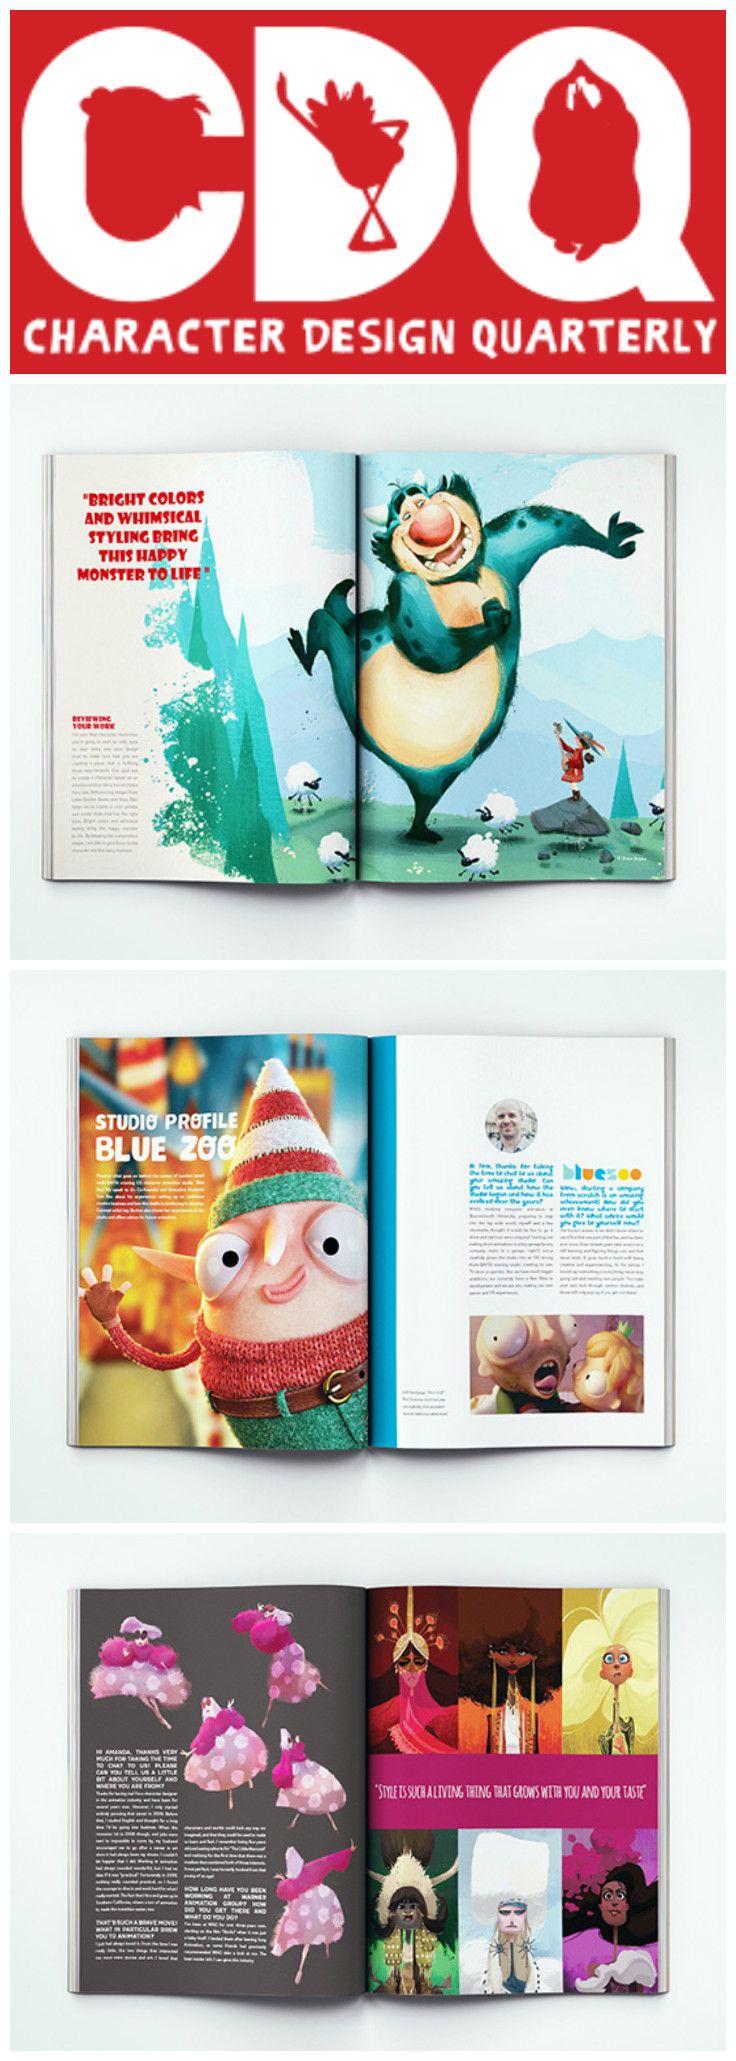 Character Design Quarterly Magazine : Best dartist magazine images on pinterest interview